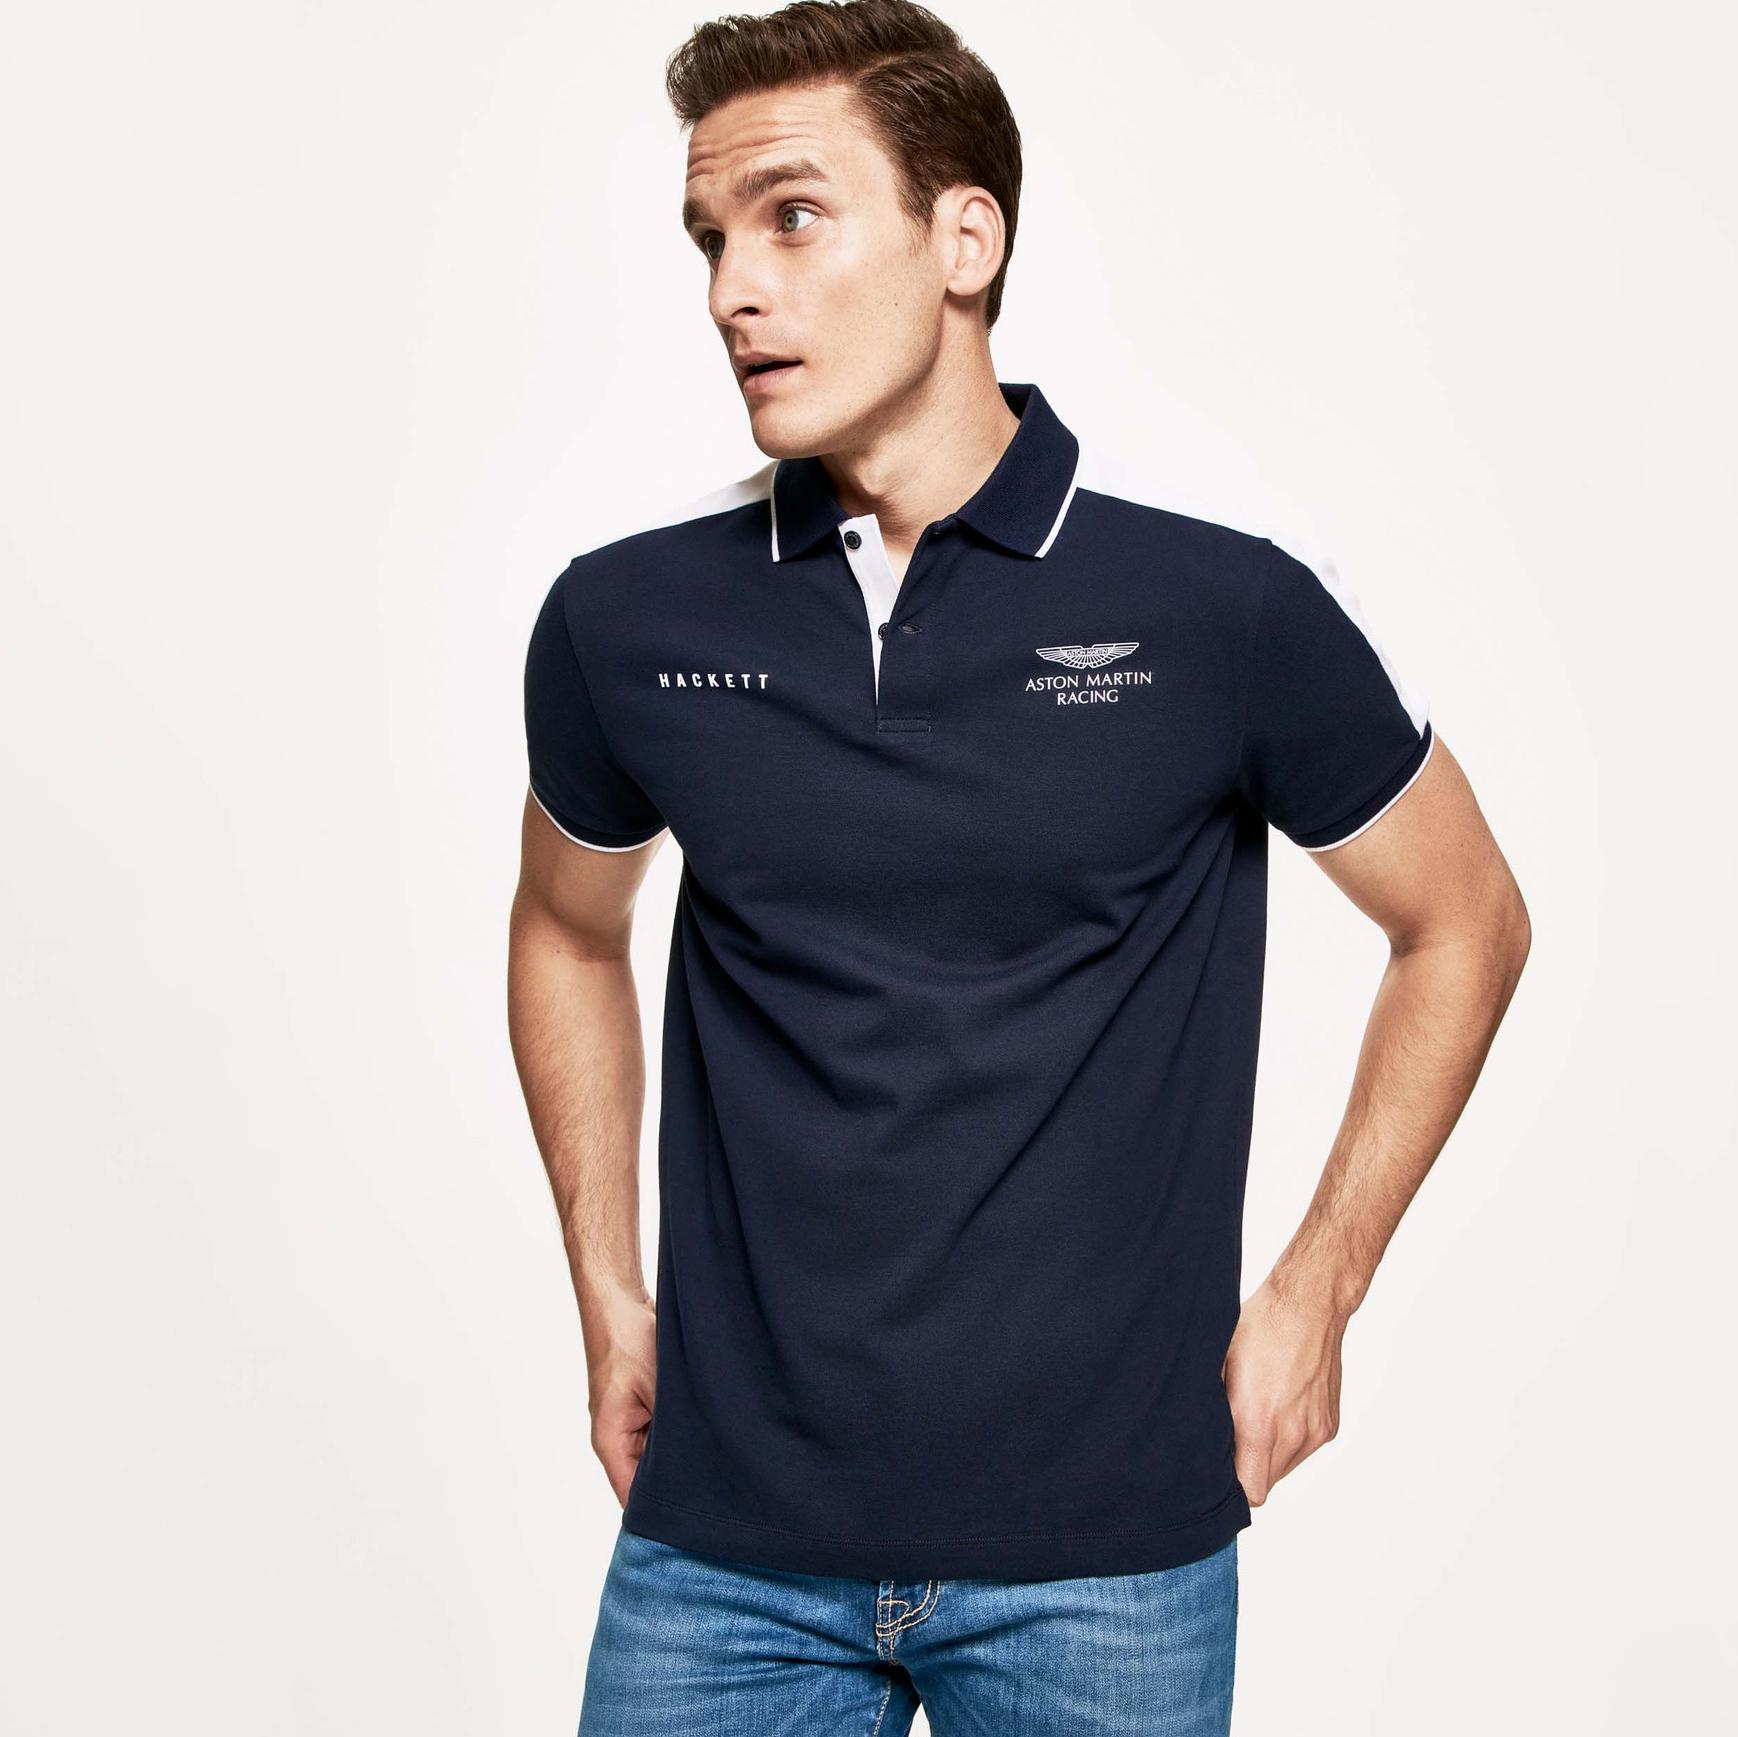 Men s T Shirt 2019 Summer New Color Matching Printed Polo Shirt ... a25b5c3f1bc8